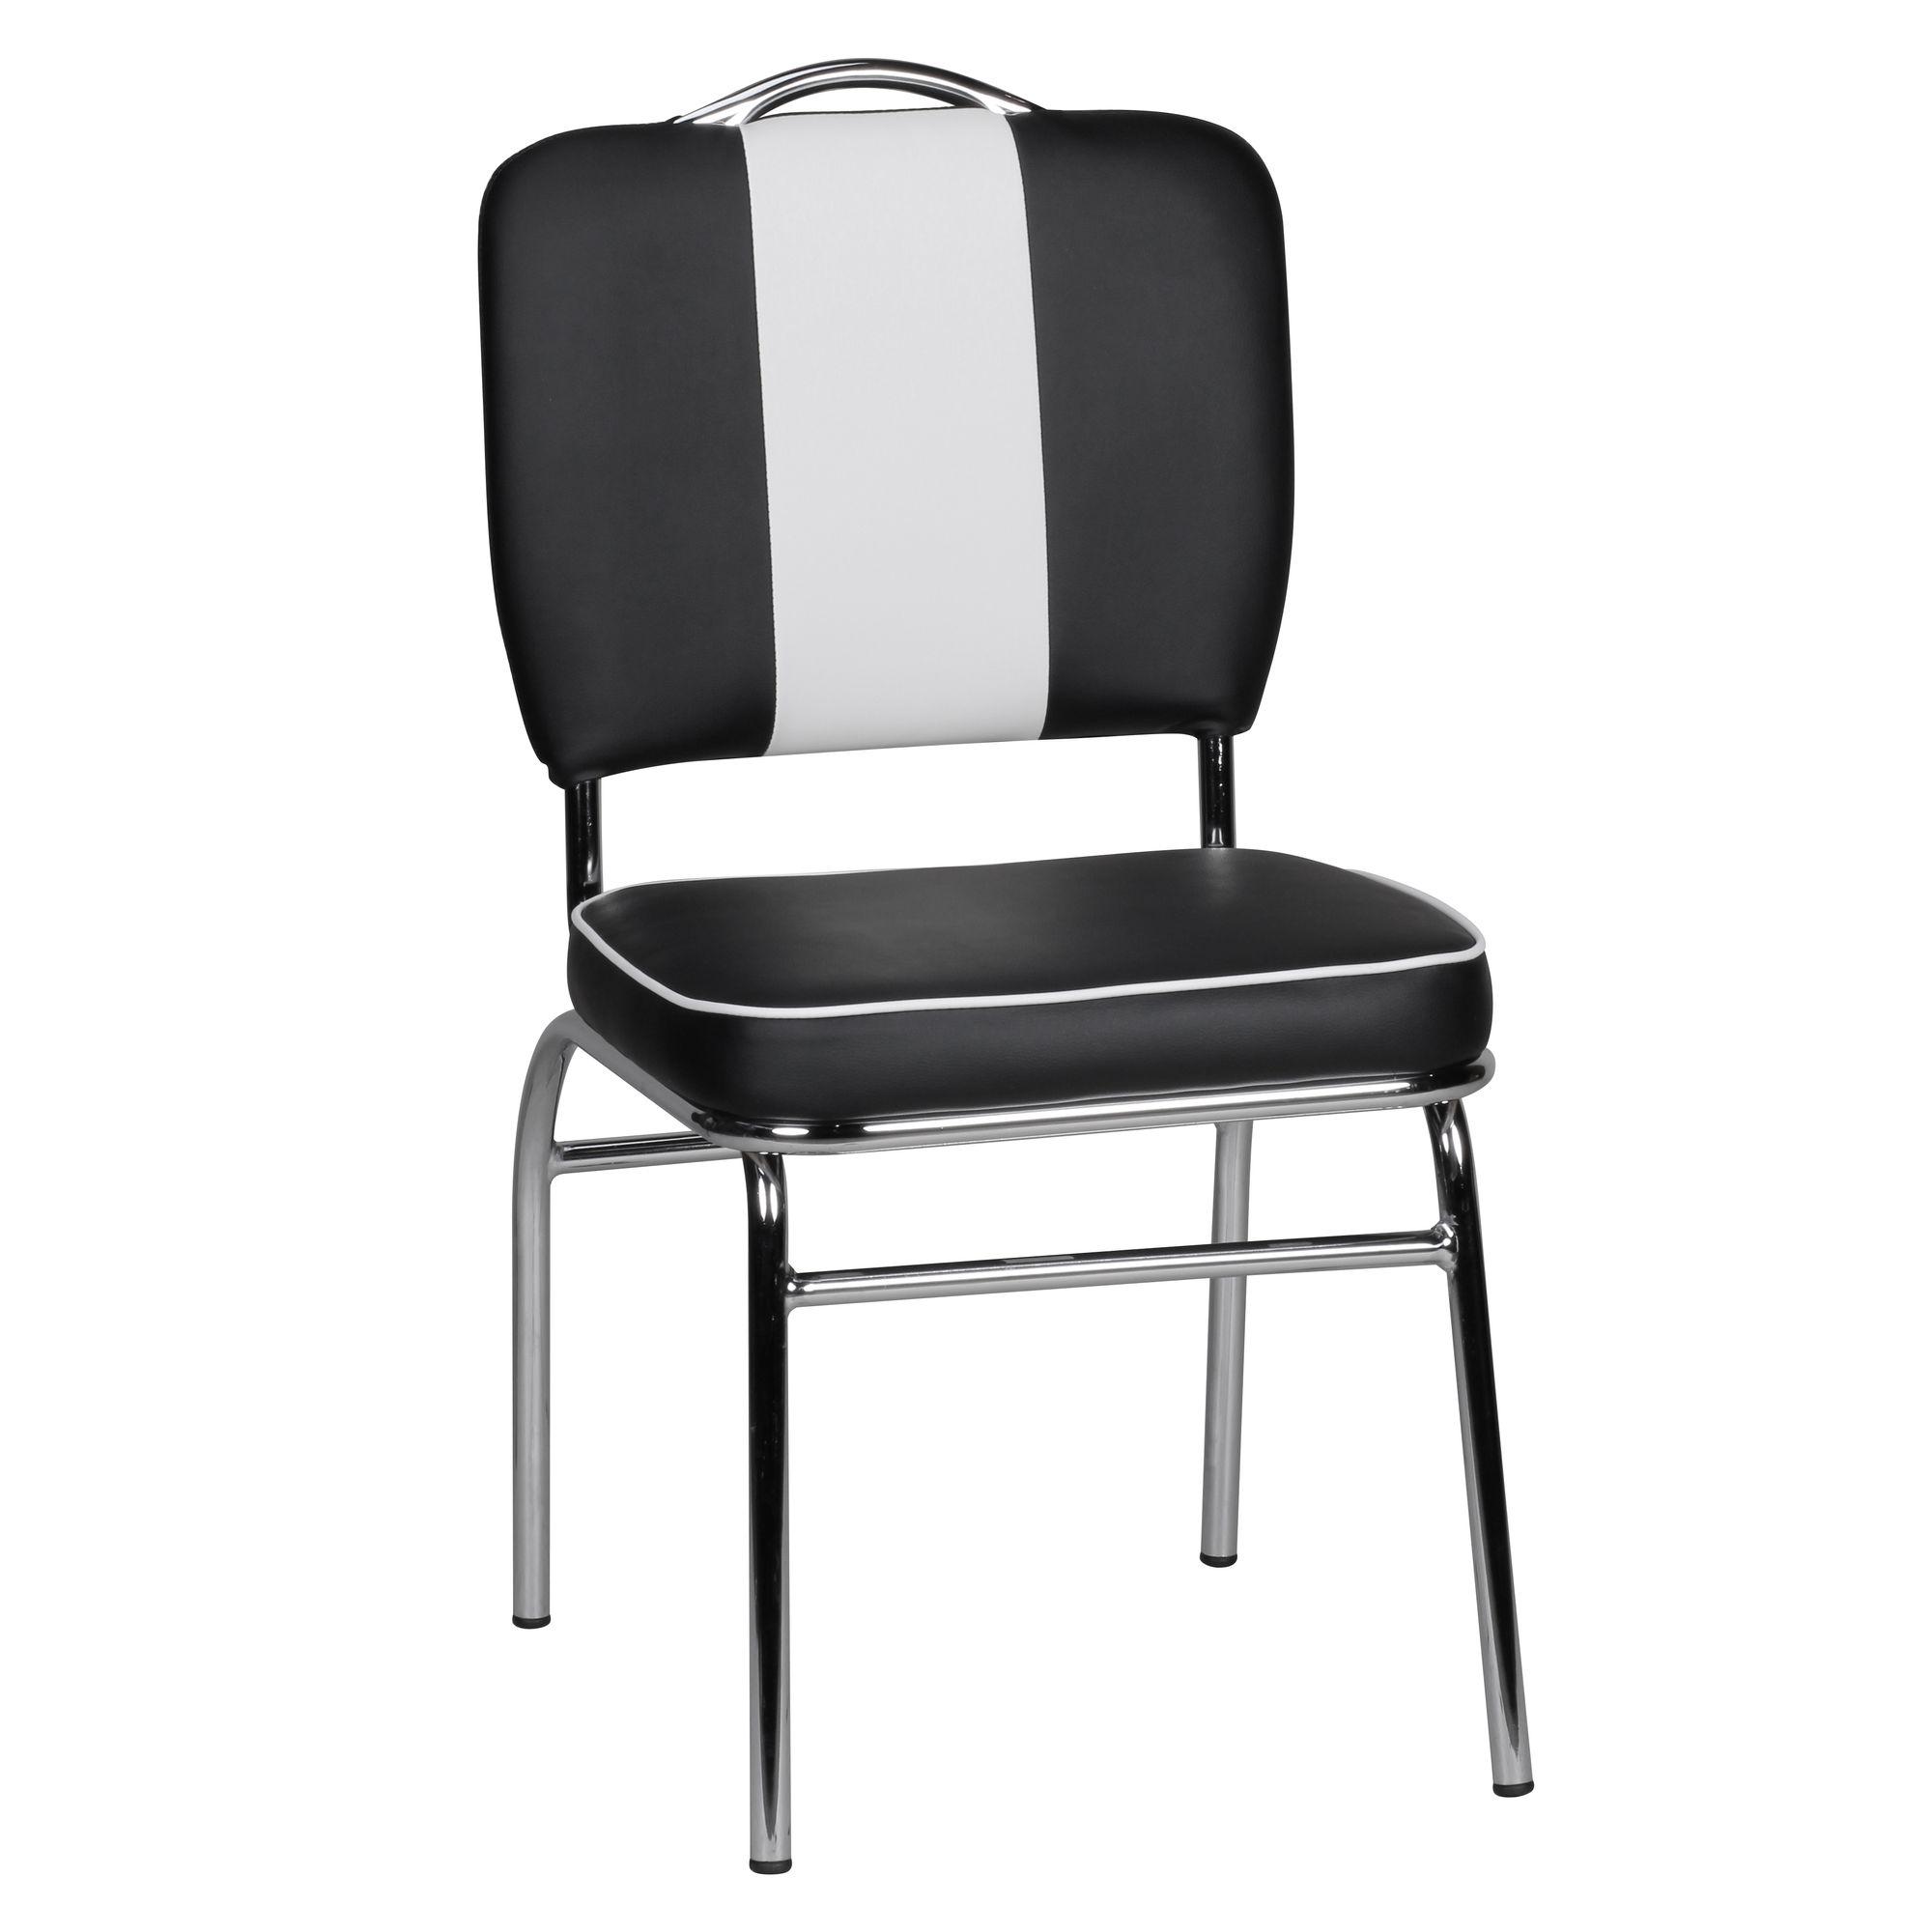 American Schwarz Sessel Stuhl Kunstleder Retro Esszimmerstuhl Weiß Gepolstert Diner rCBdoex